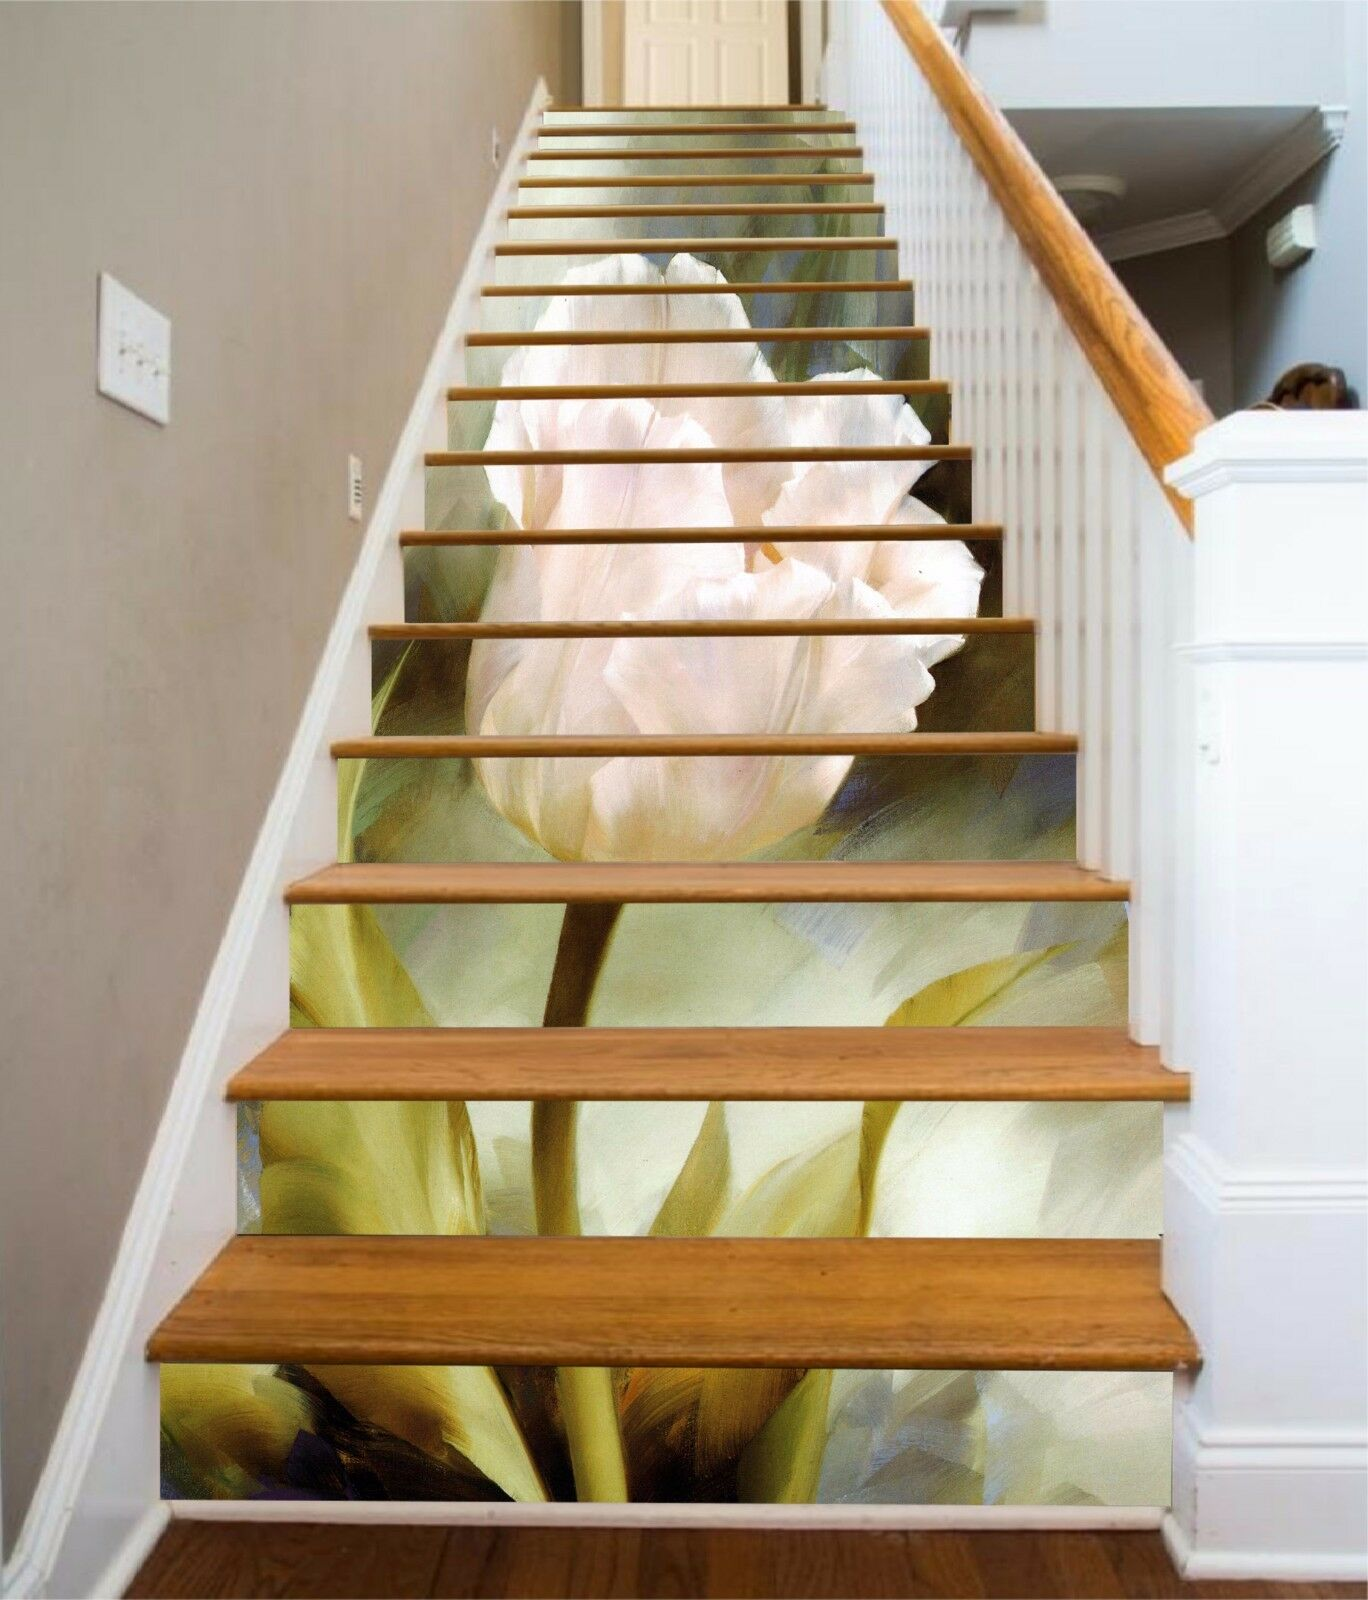 3D Weiß flower 32 Stair Risers Decoration Photo Mural Vinyl Decal Wallpaper UK